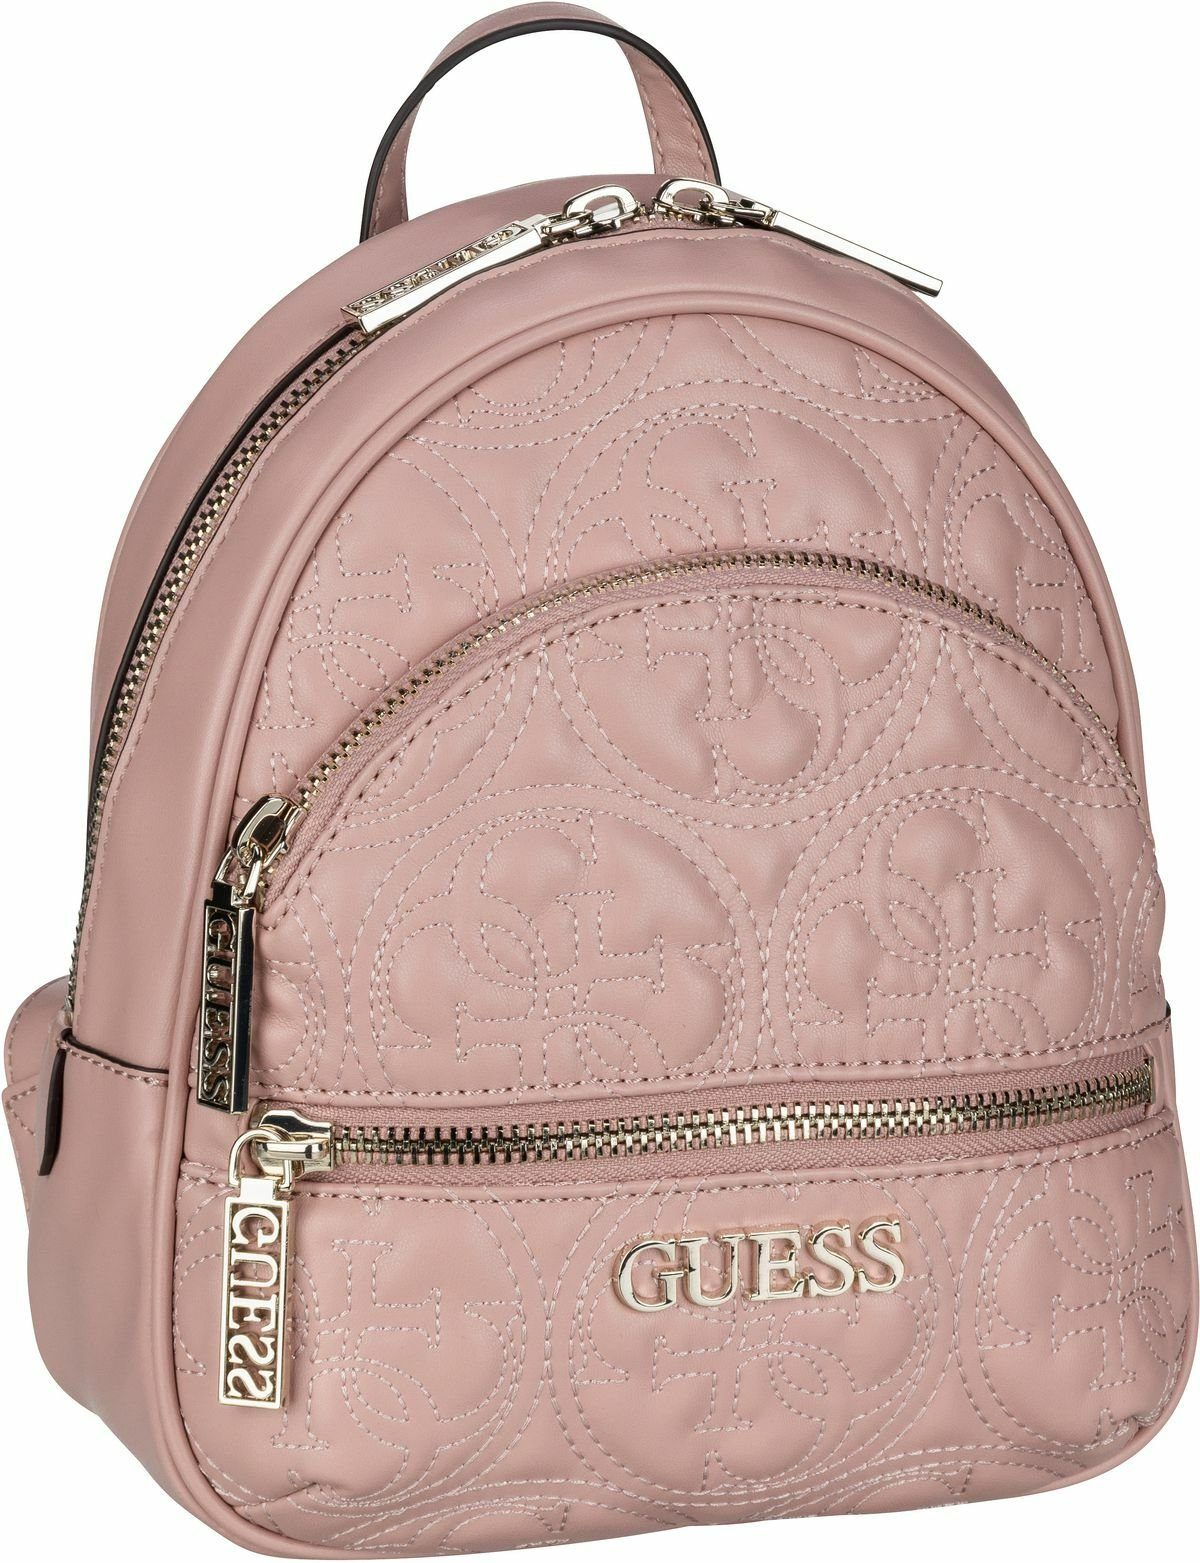 Guess Rucksack Daypack »Manhattan Small Backpack« online kaufen | OTTO